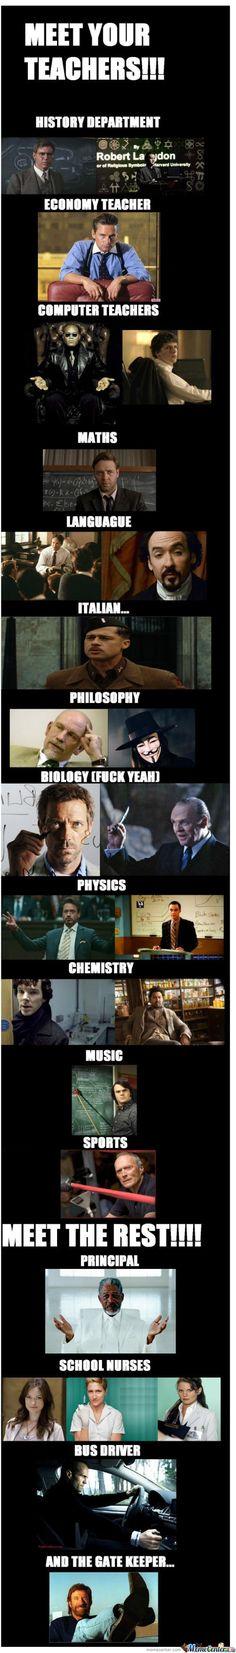 YESSS!!!!!    Please let Tony Stark teach my physics and Sherlock teach me Chemistry... Please, please, PLEASSSSE!!!!!!